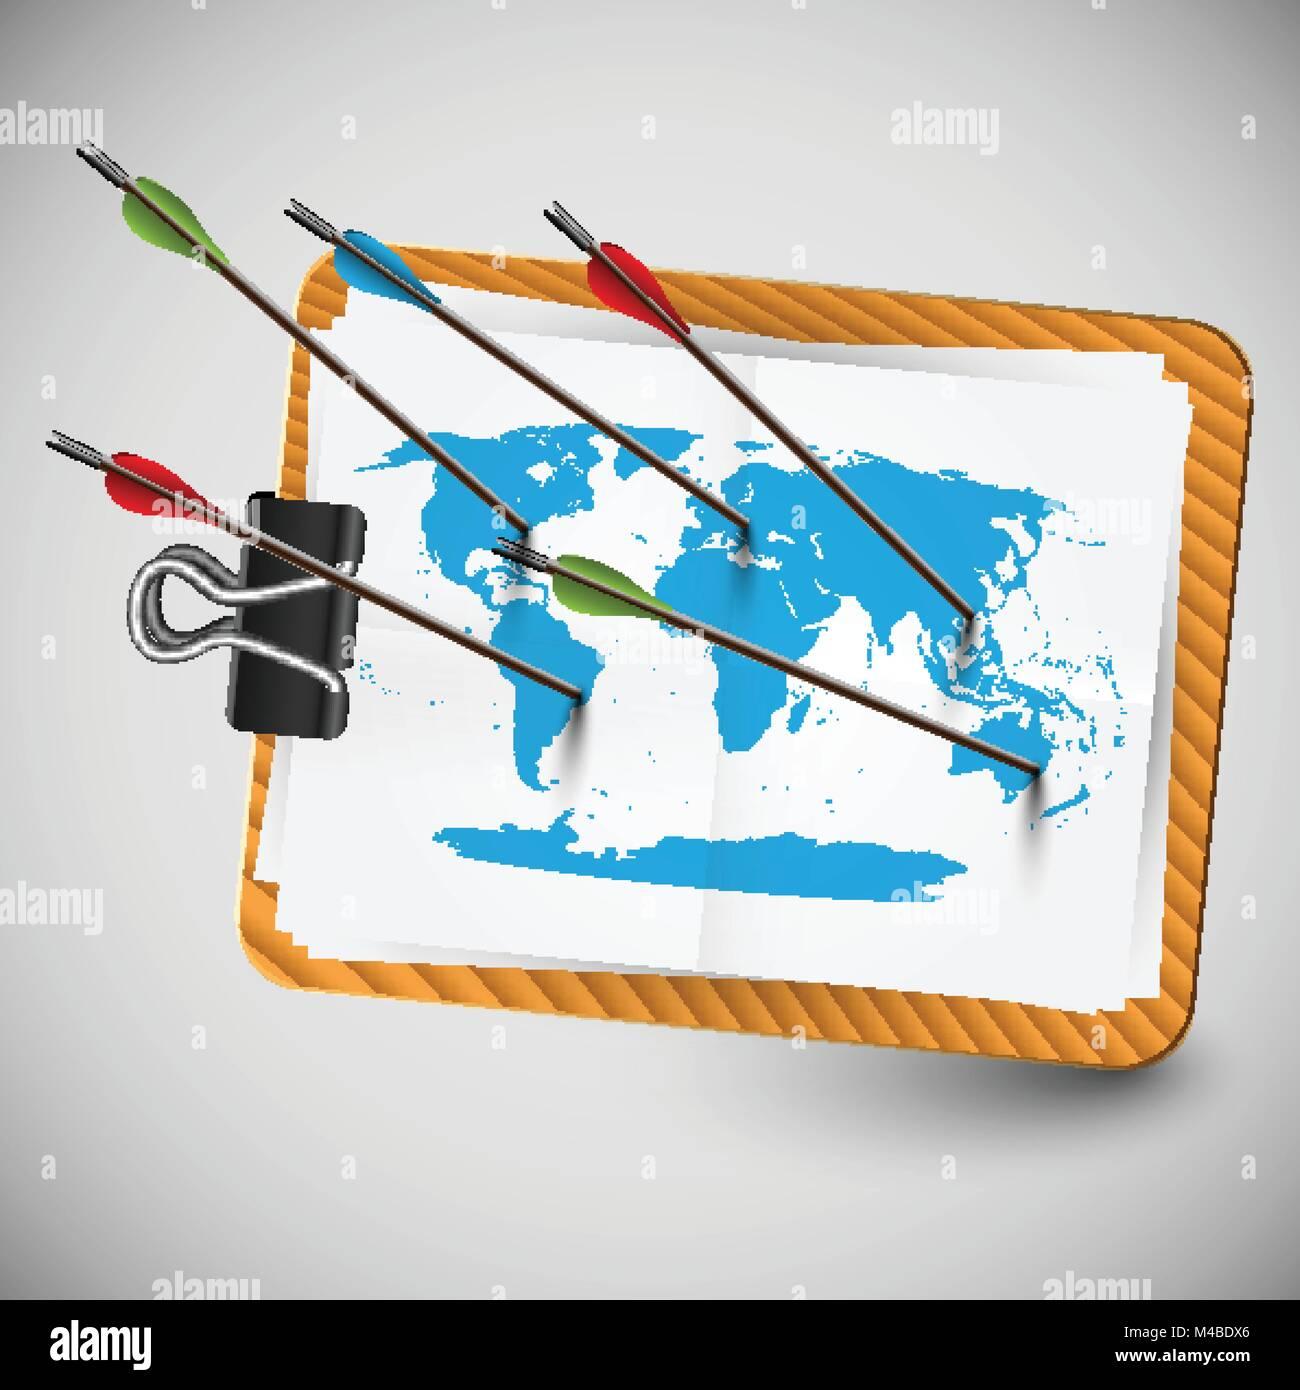 World map with arrows vector stock vector art illustration world map with arrows vector gumiabroncs Gallery